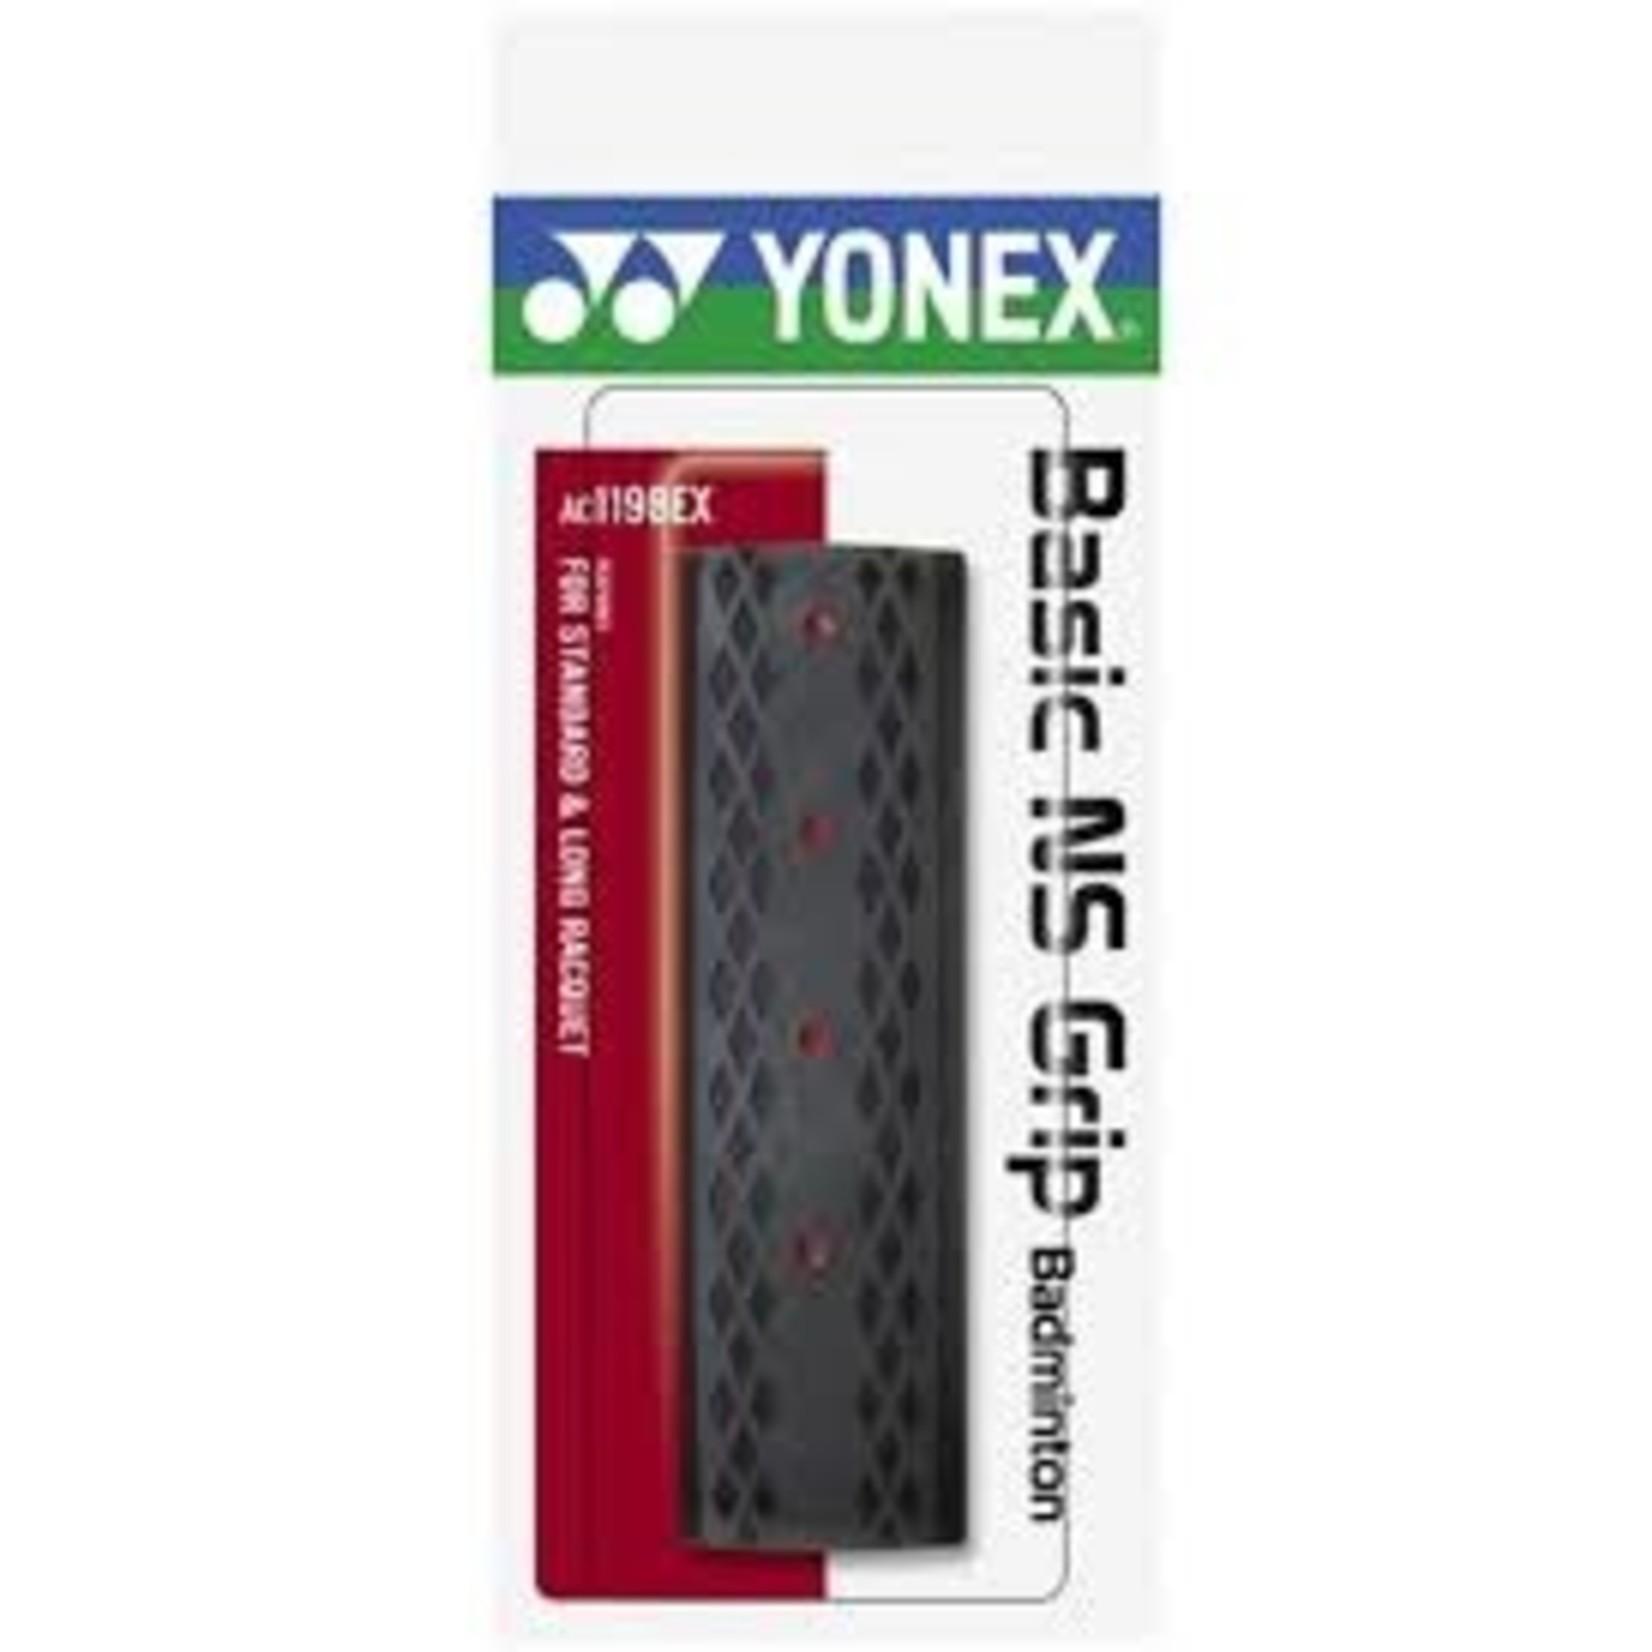 Yonex Badminton Nanospeed basisgrip